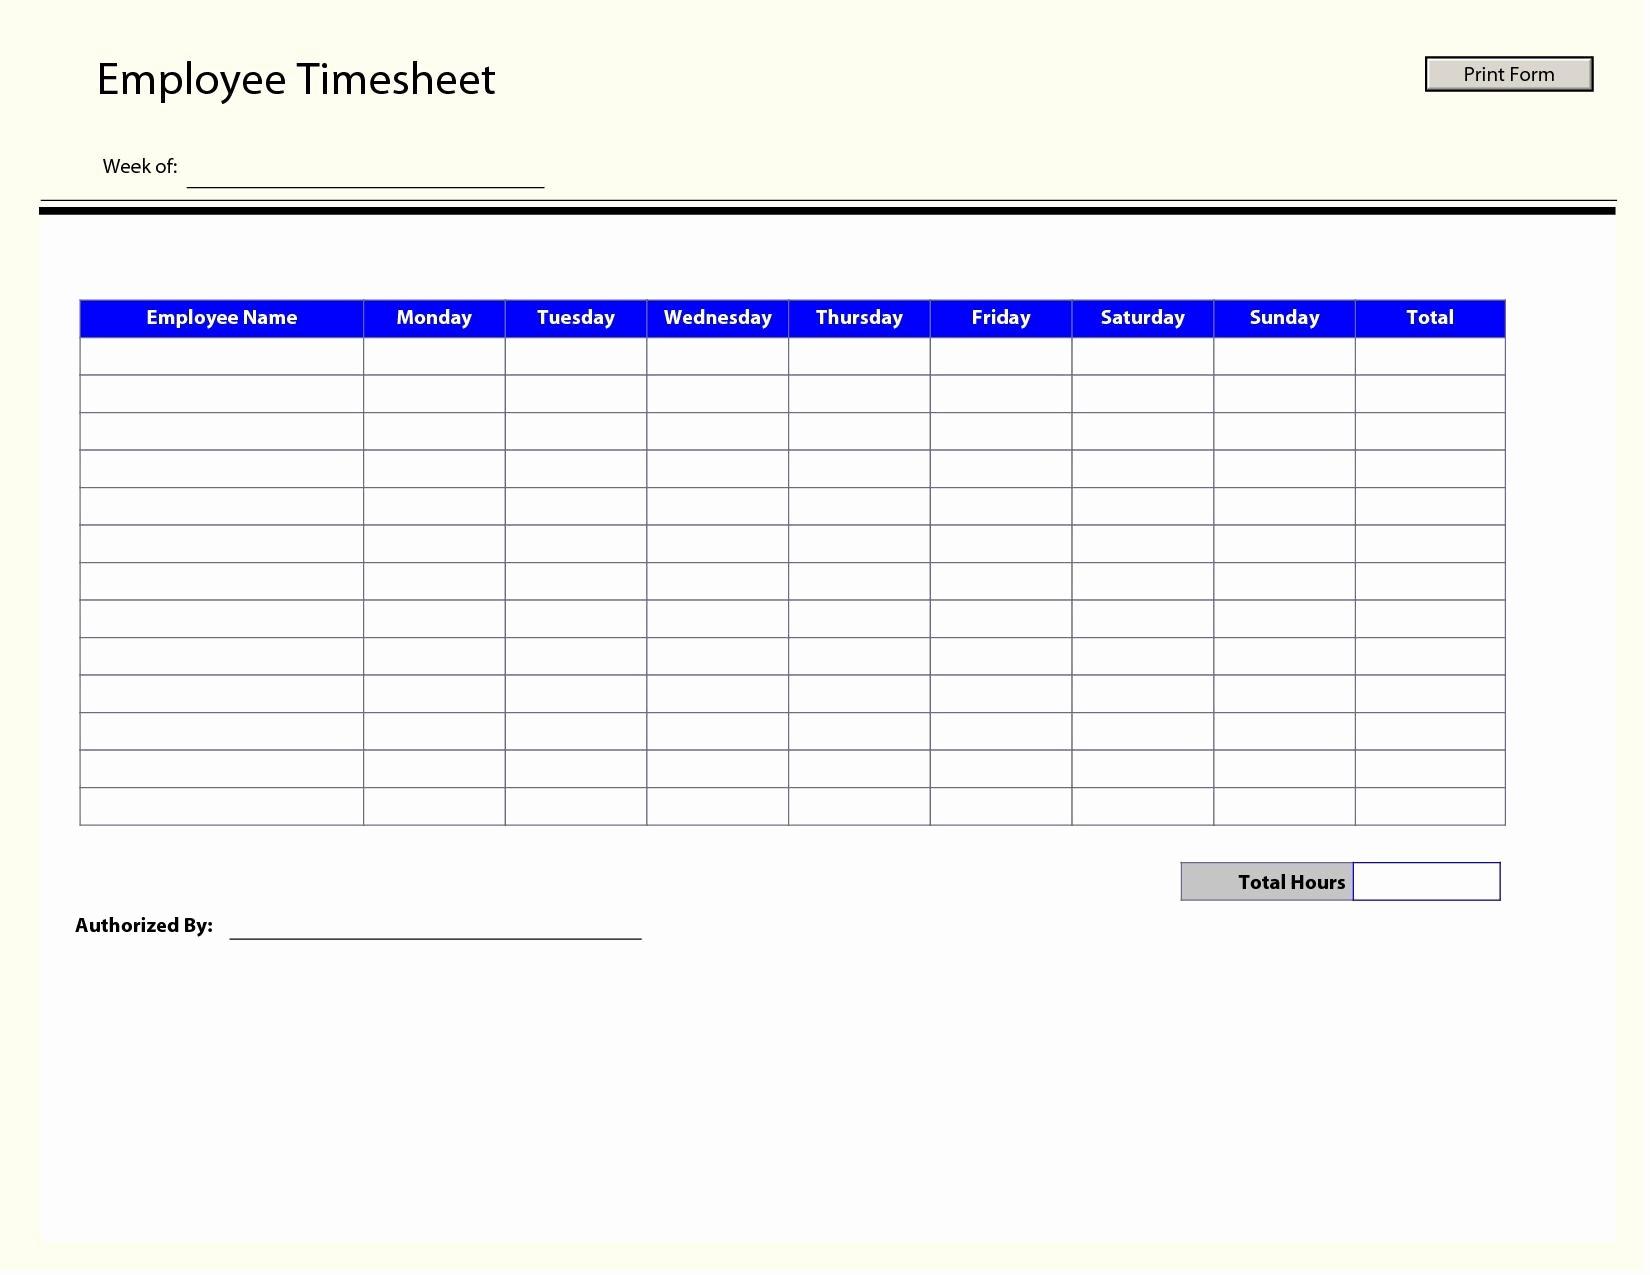 Timesheet Techmahindra General Free Simple Excel Employee Timesheet In Employee Timesheet Template